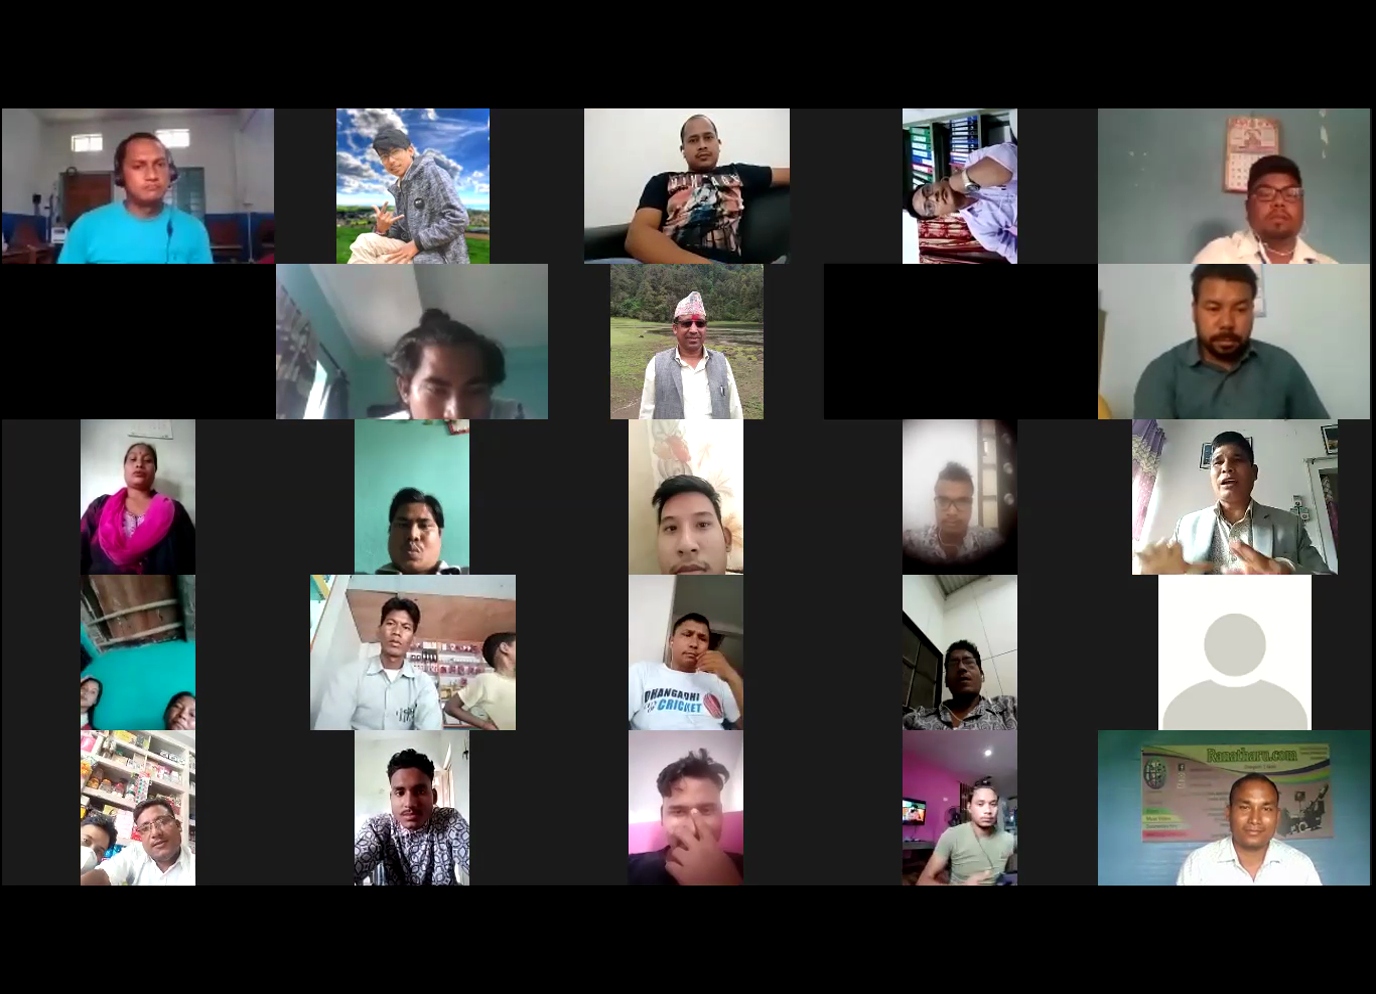 रानाथारु डटकम, जुम कन्फ्रेन्स द्वारा संचालित जागरण कार्यक्रम भव्यताके साथ निभटो